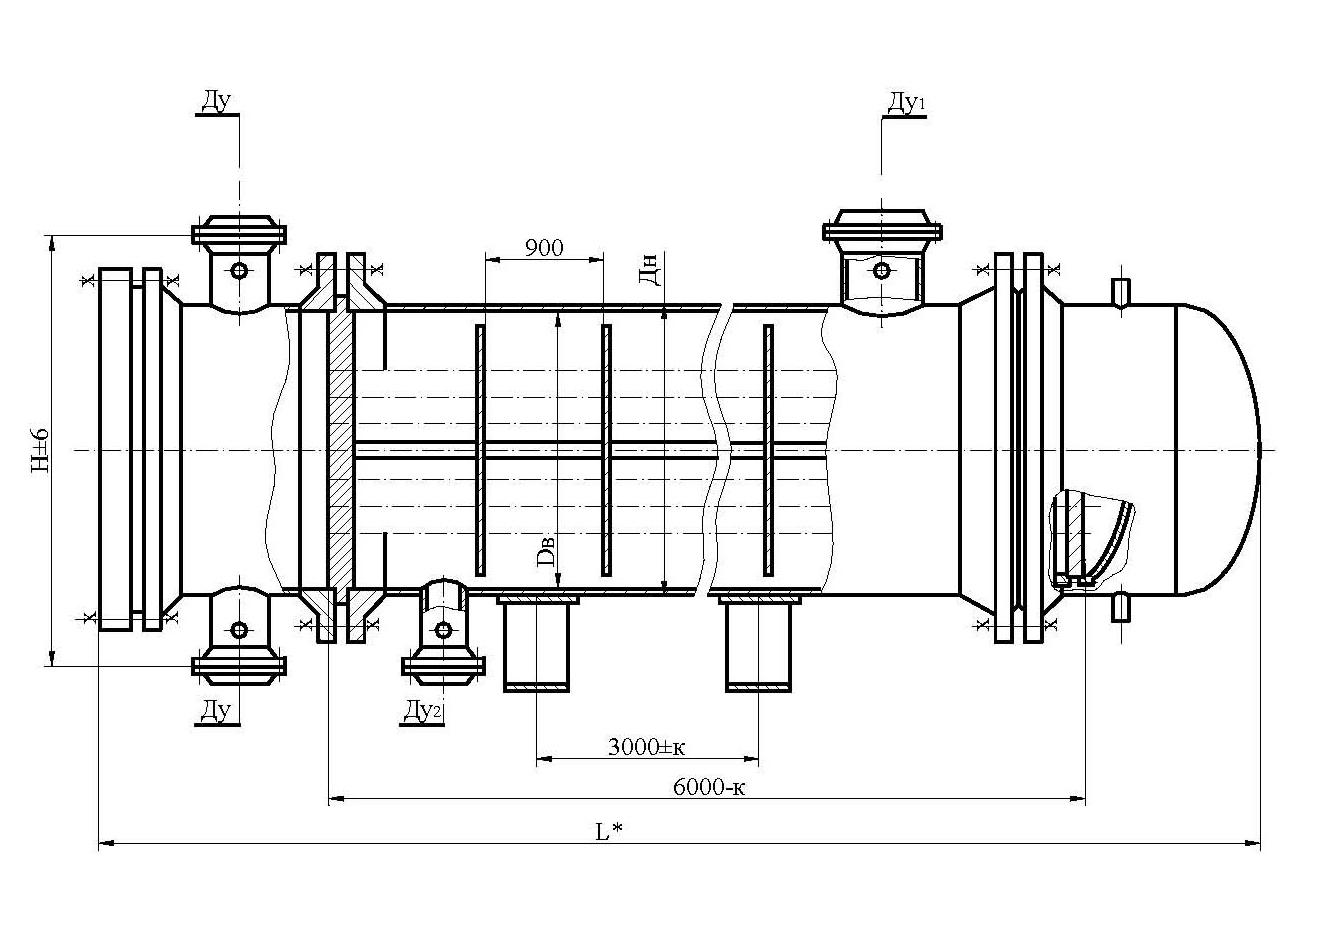 Теплообменник тпг 1200 Уплотнения теплообменника Sondex SF229 Дзержинск